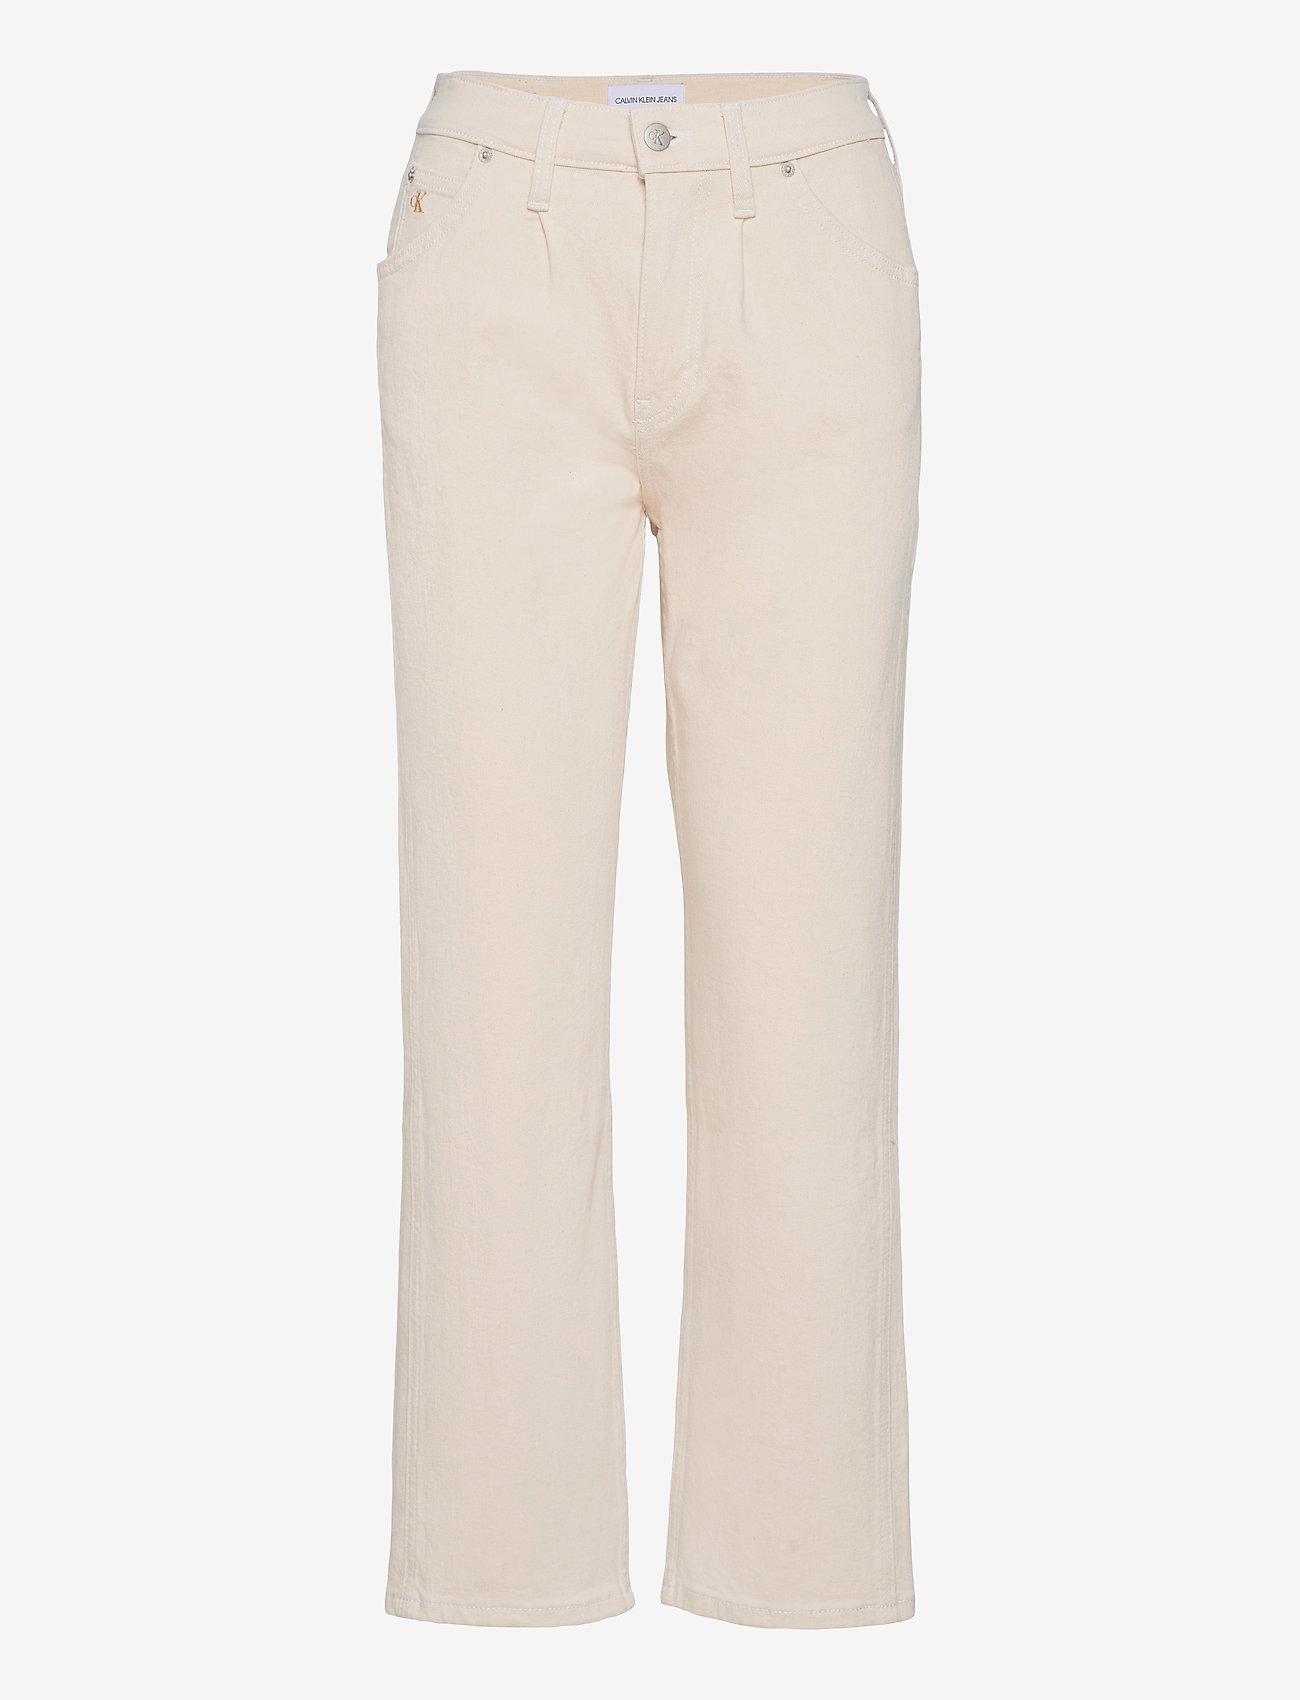 Calvin Klein Jeans - HIGH RISE STRAIGHT ANKLE - straight jeans - denim light - 0